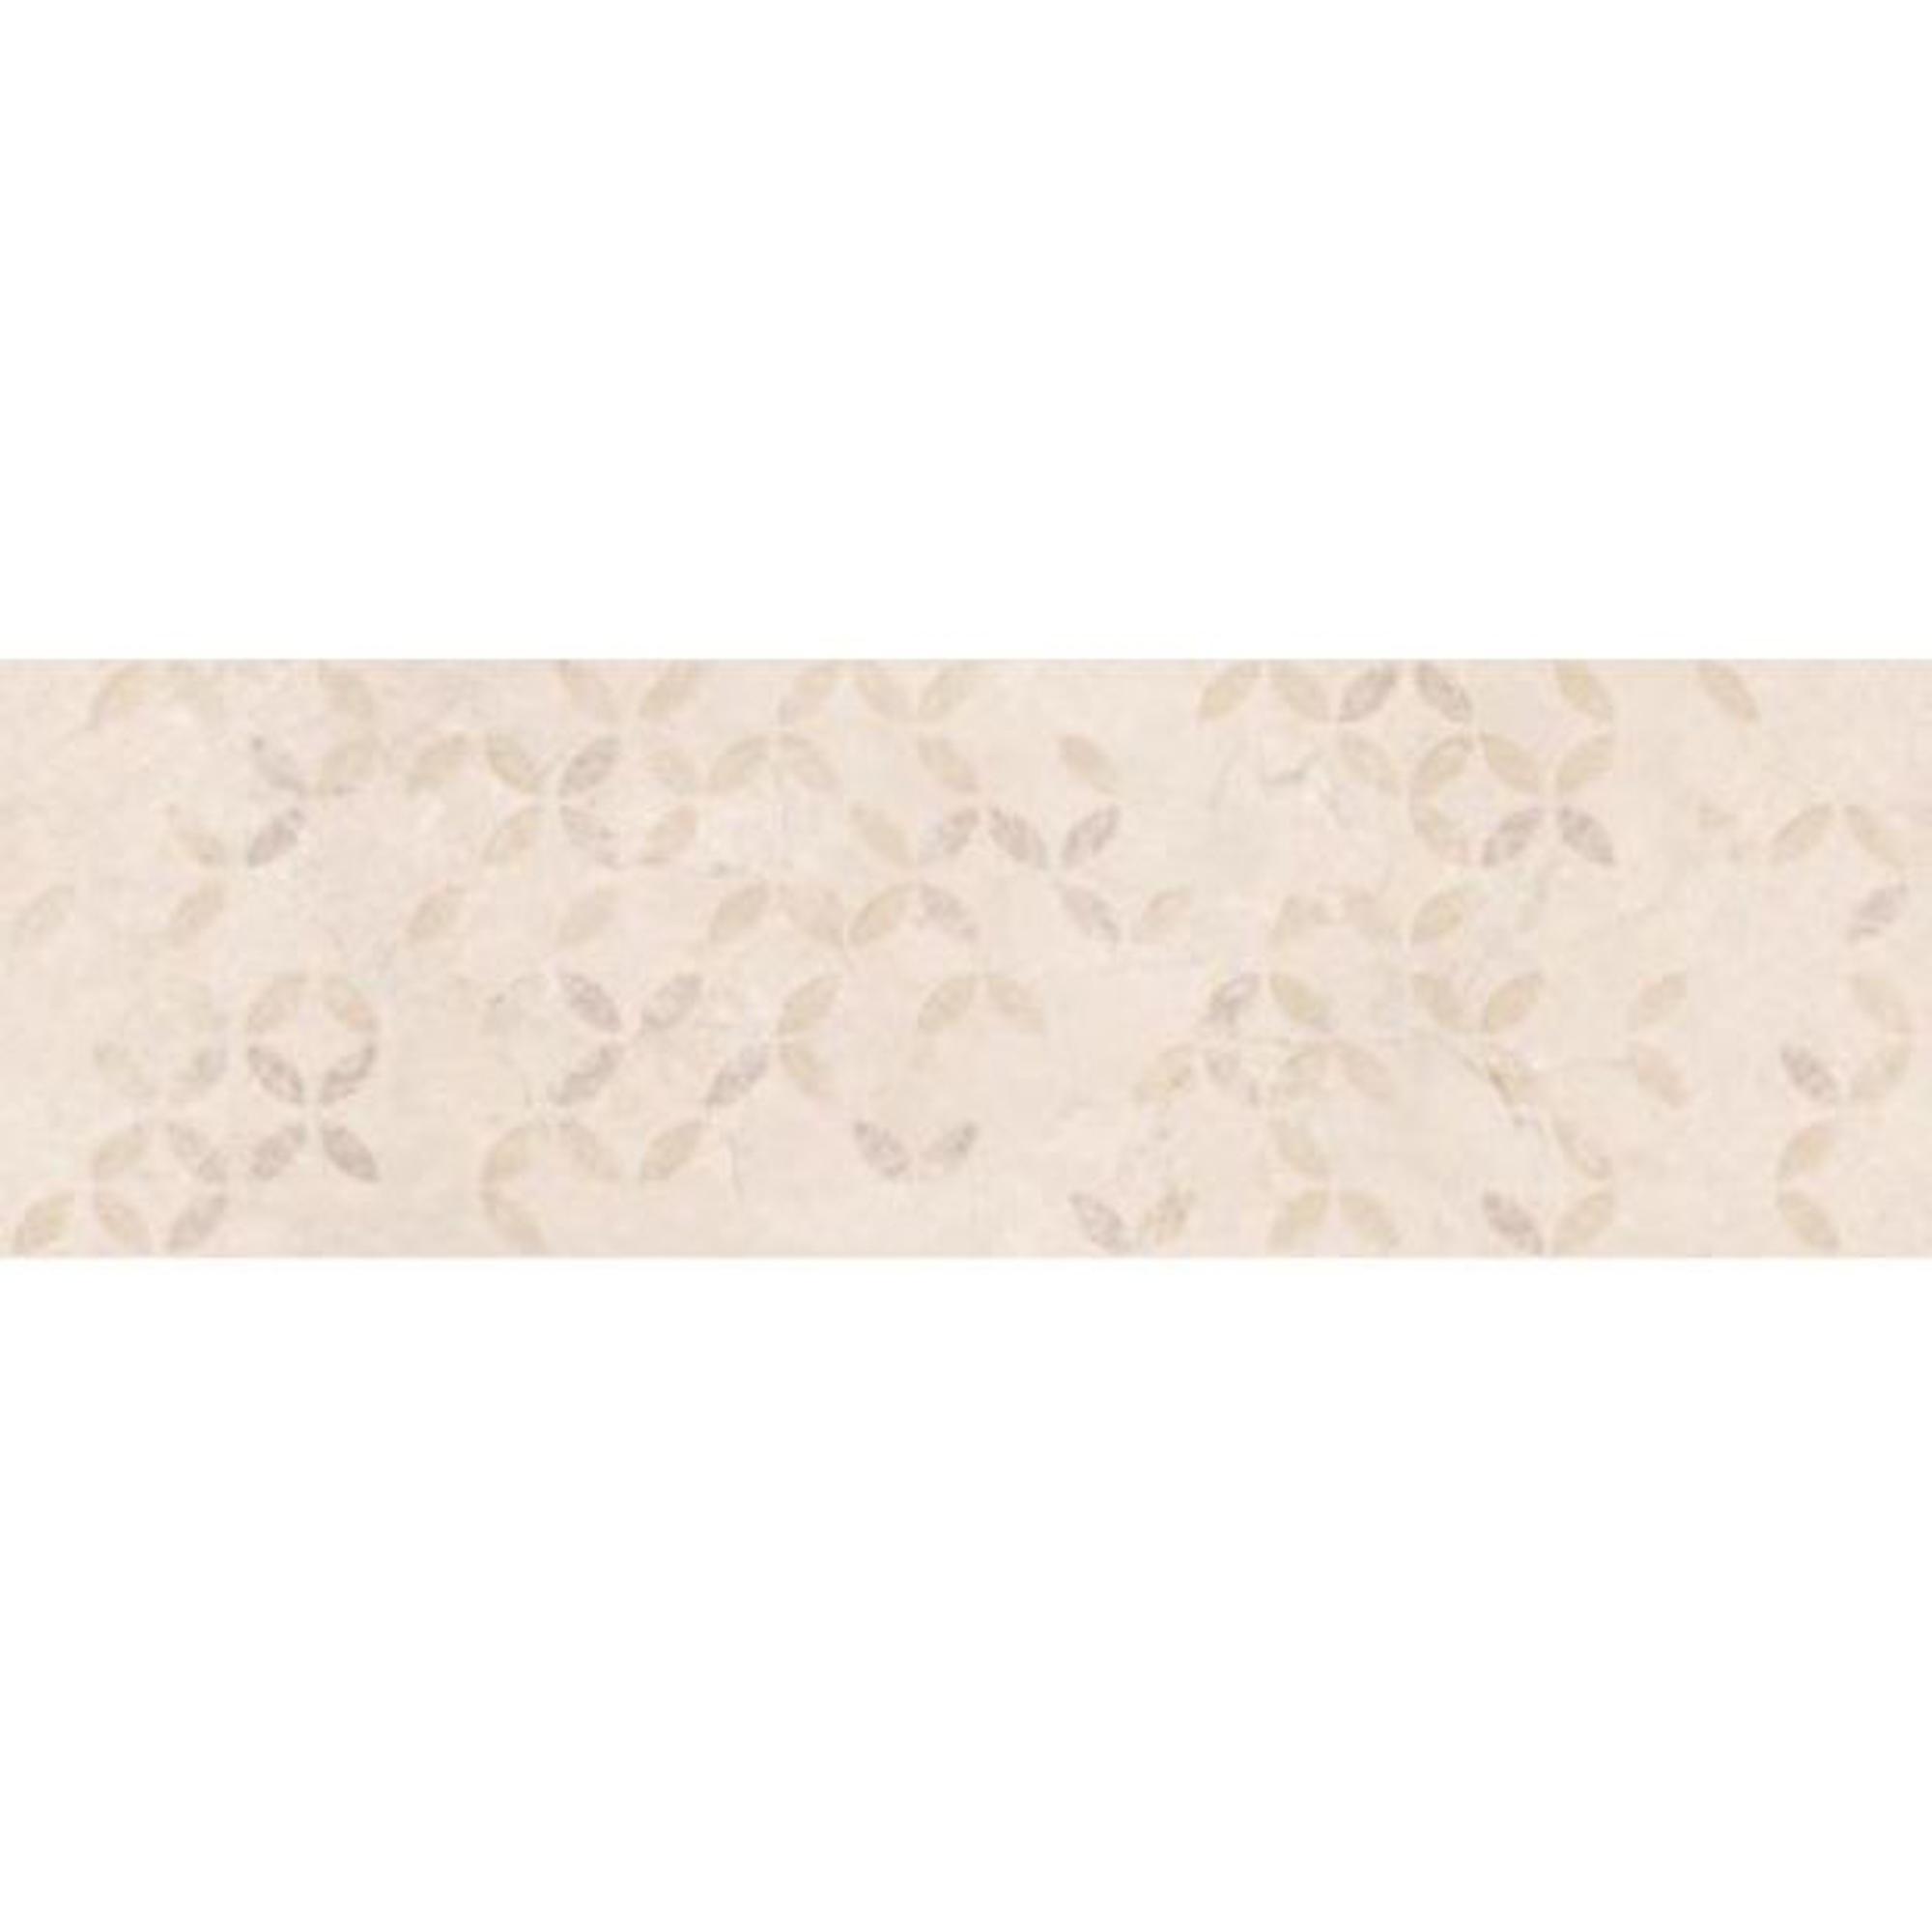 Плитка Undefasa Decorado Crema Natural 31.5x100 см